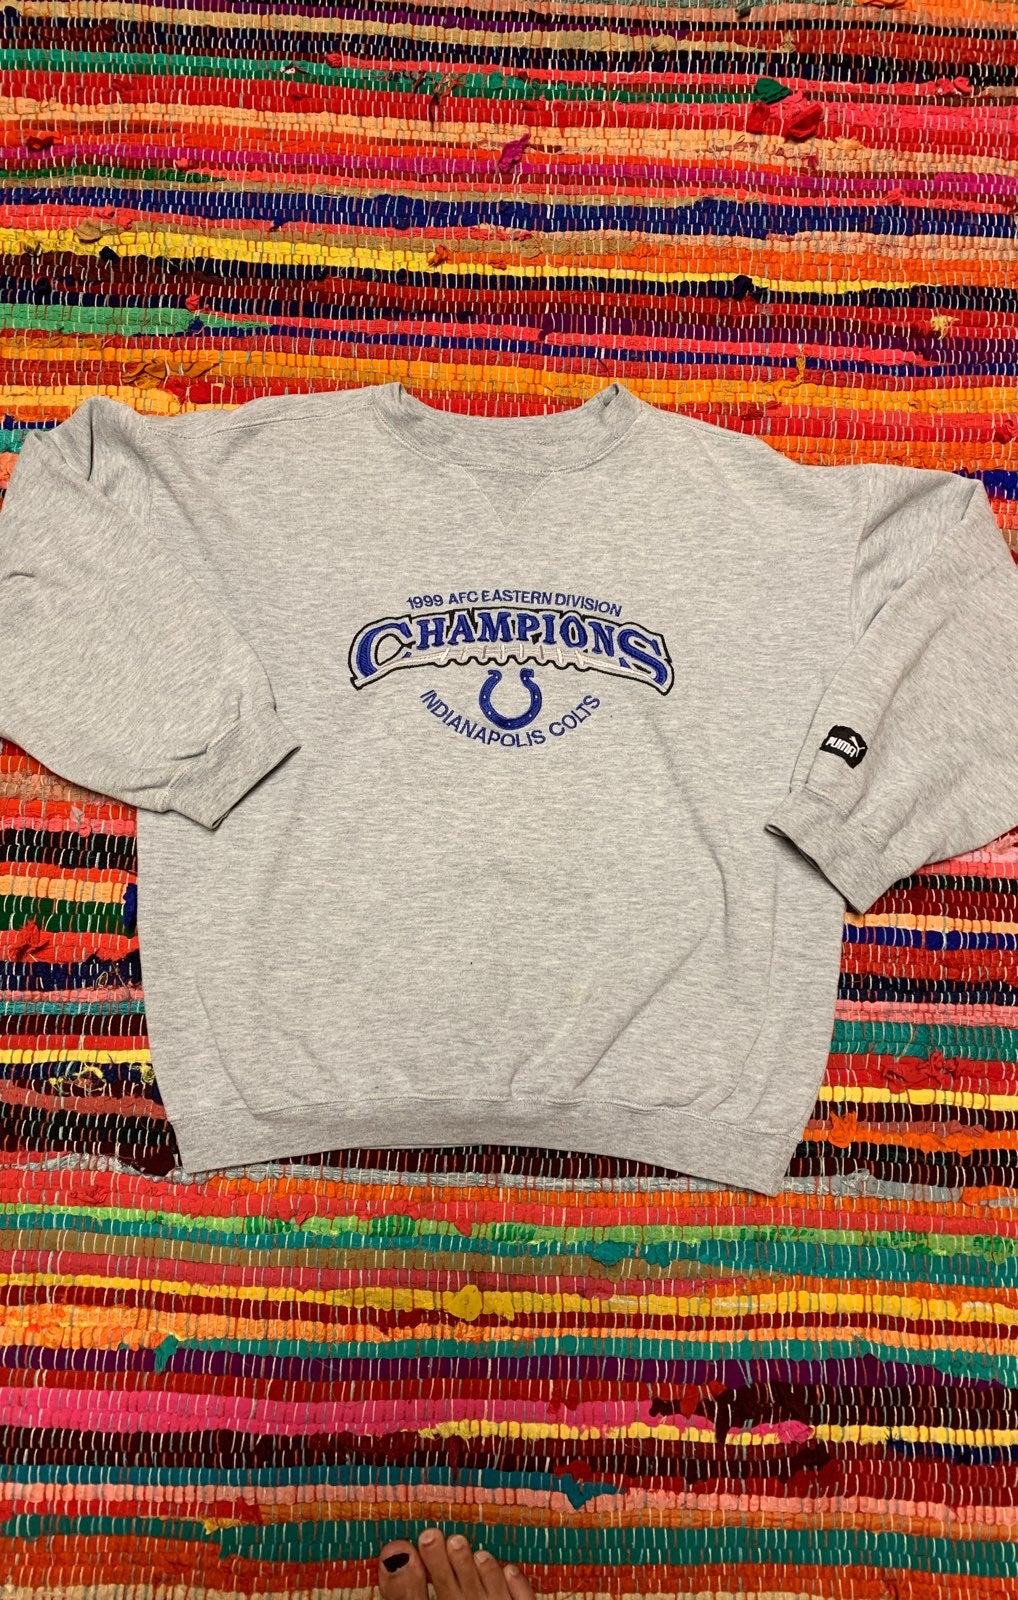 99' Indianapolis Colts Champs Crewneck